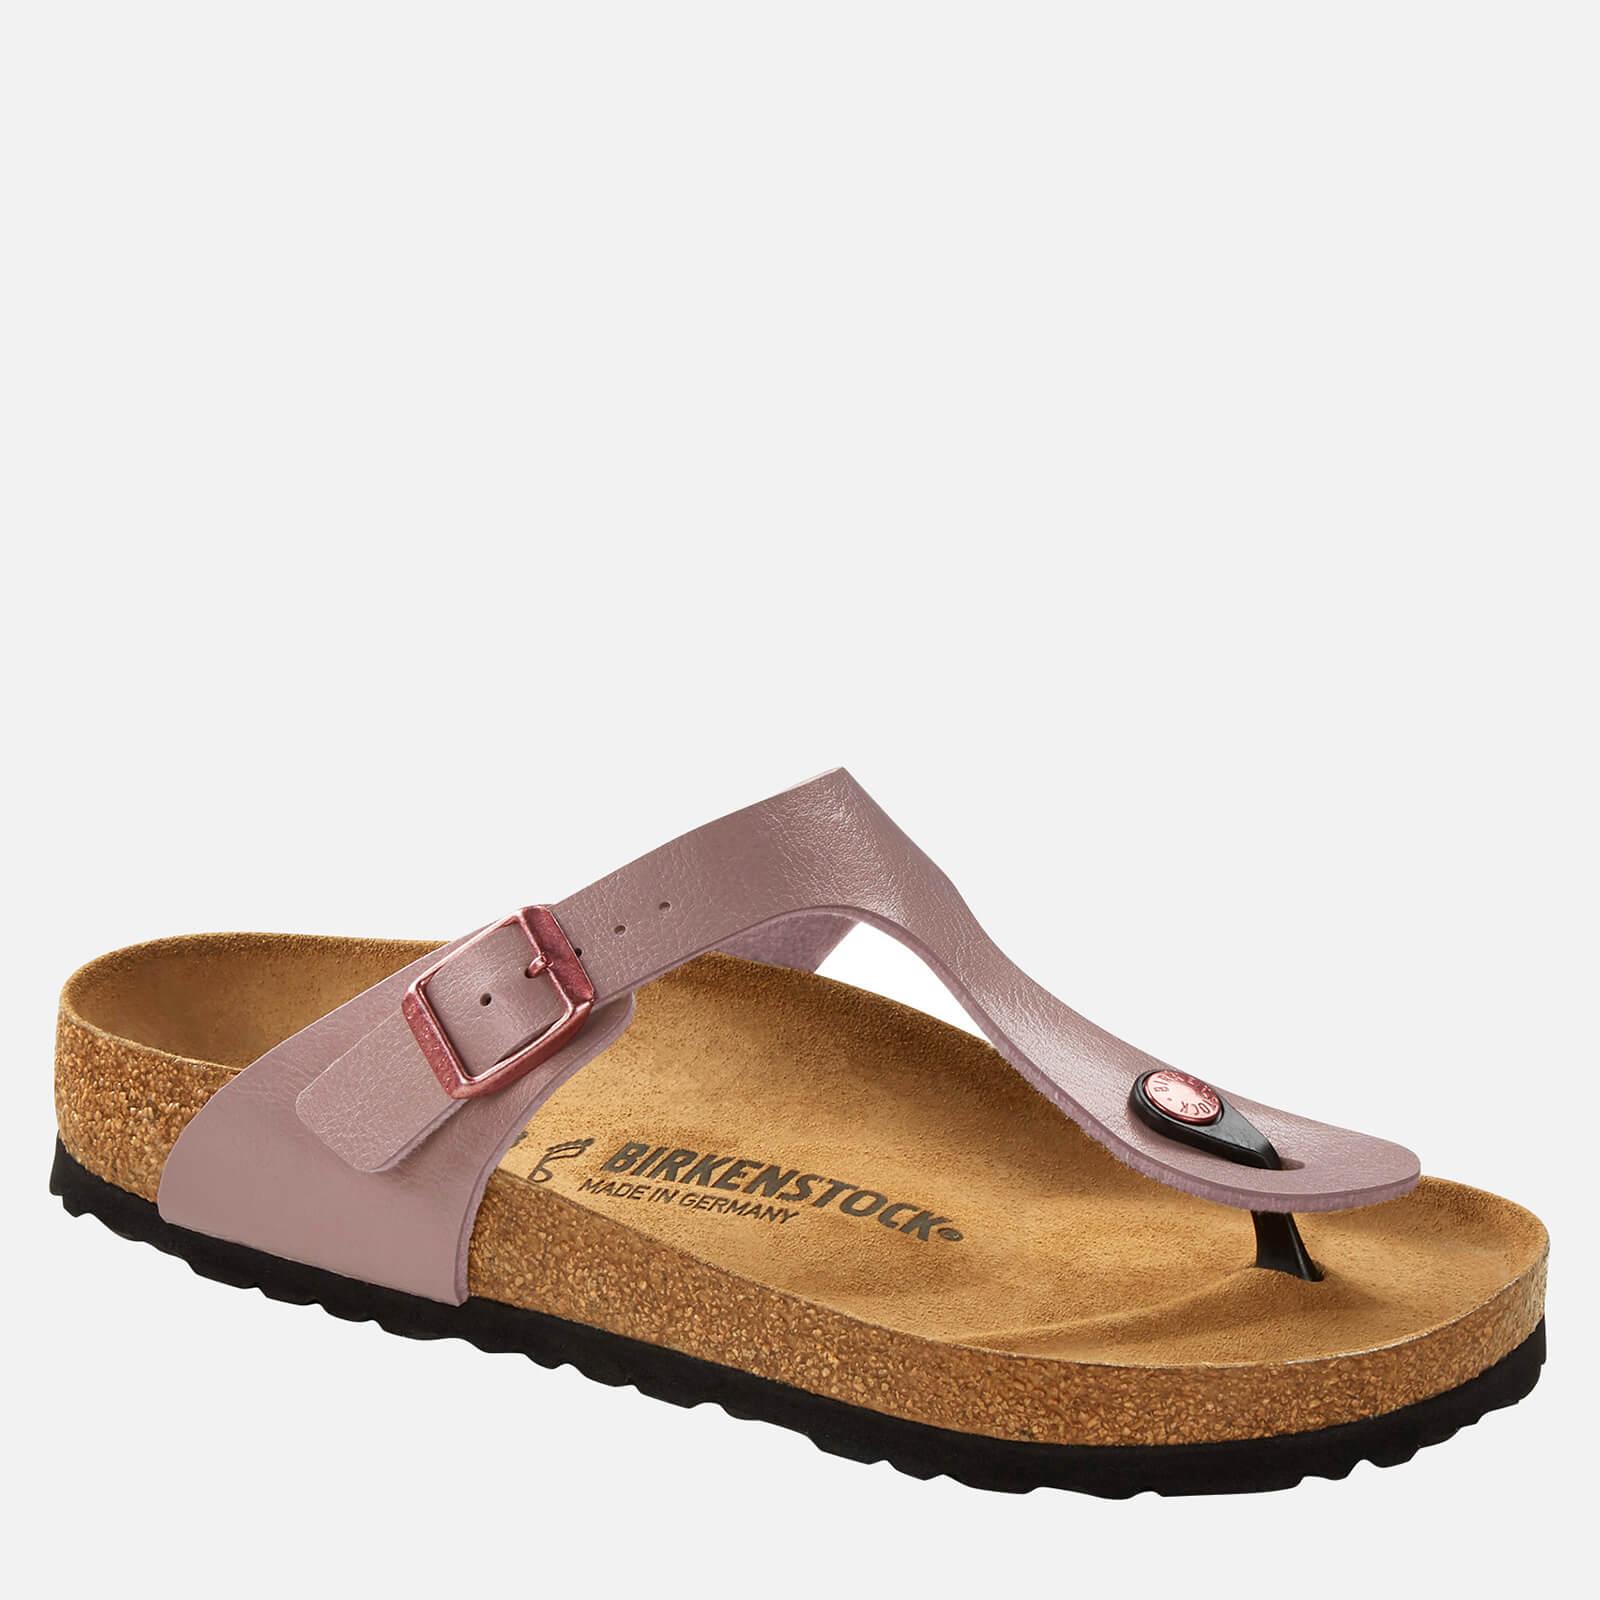 Birkenstock Womens Graceful Gizeh Toe Post Sandals Lavender Eu 36 Uk 35